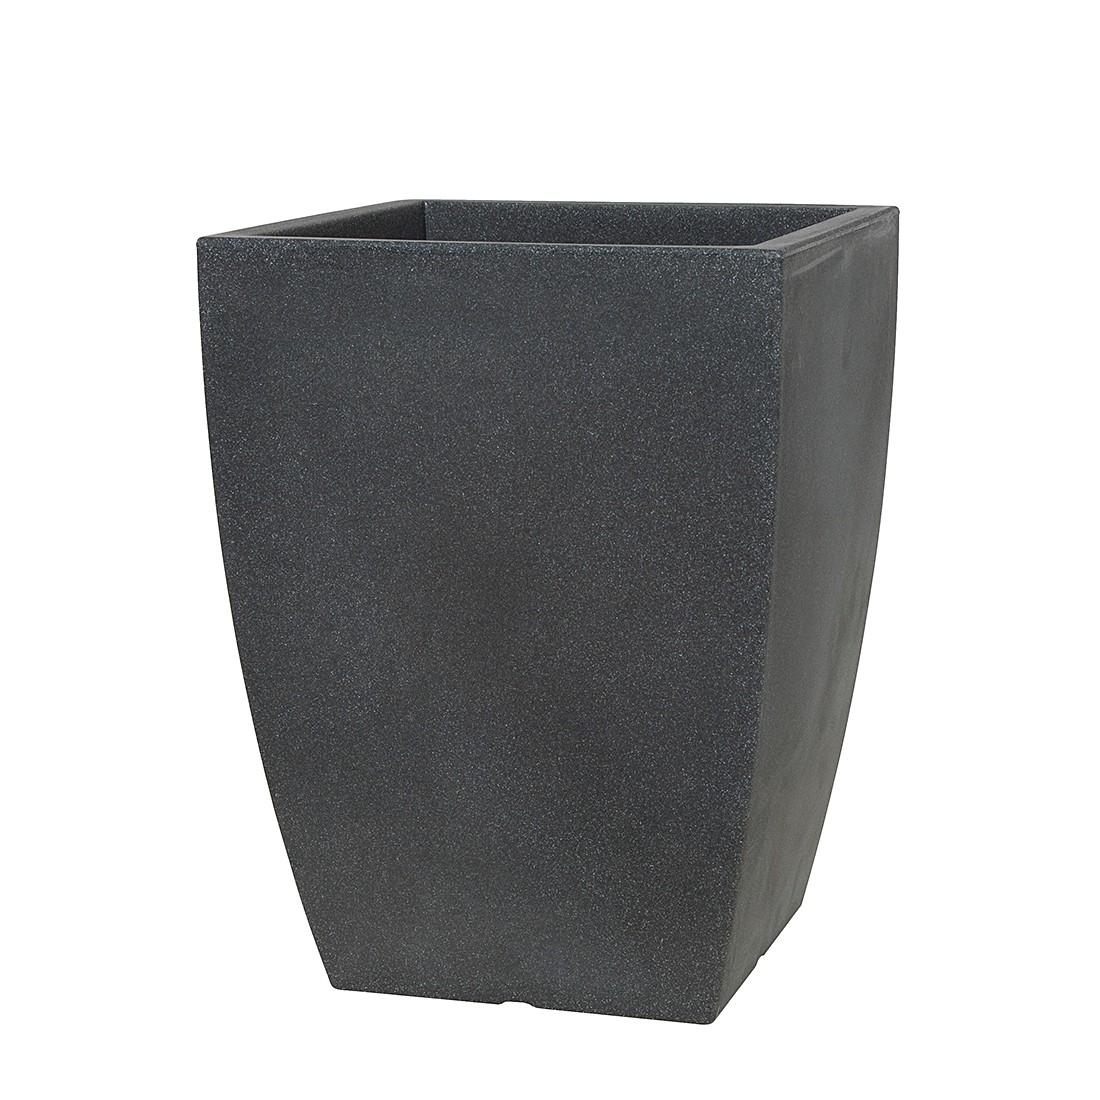 Pflanzgefäß Bologna (53cm) – schwarz granit, PP-PLASTIC günstig